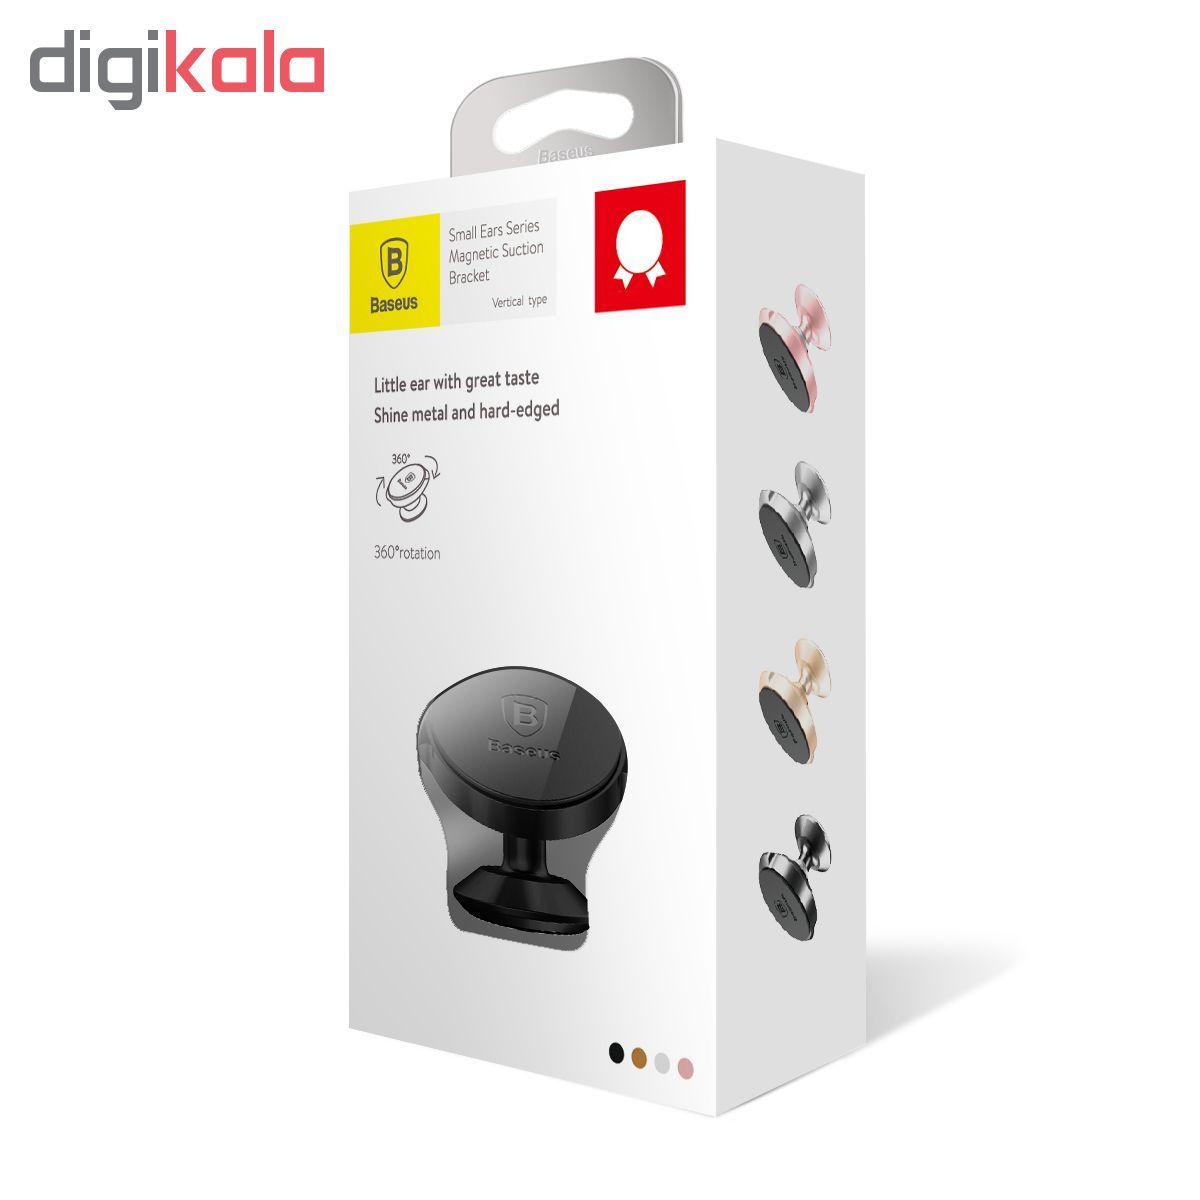 پایه نگهدارنده گوشی موبایل باسئوس مدل Small Ear Vertical Type main 1 5